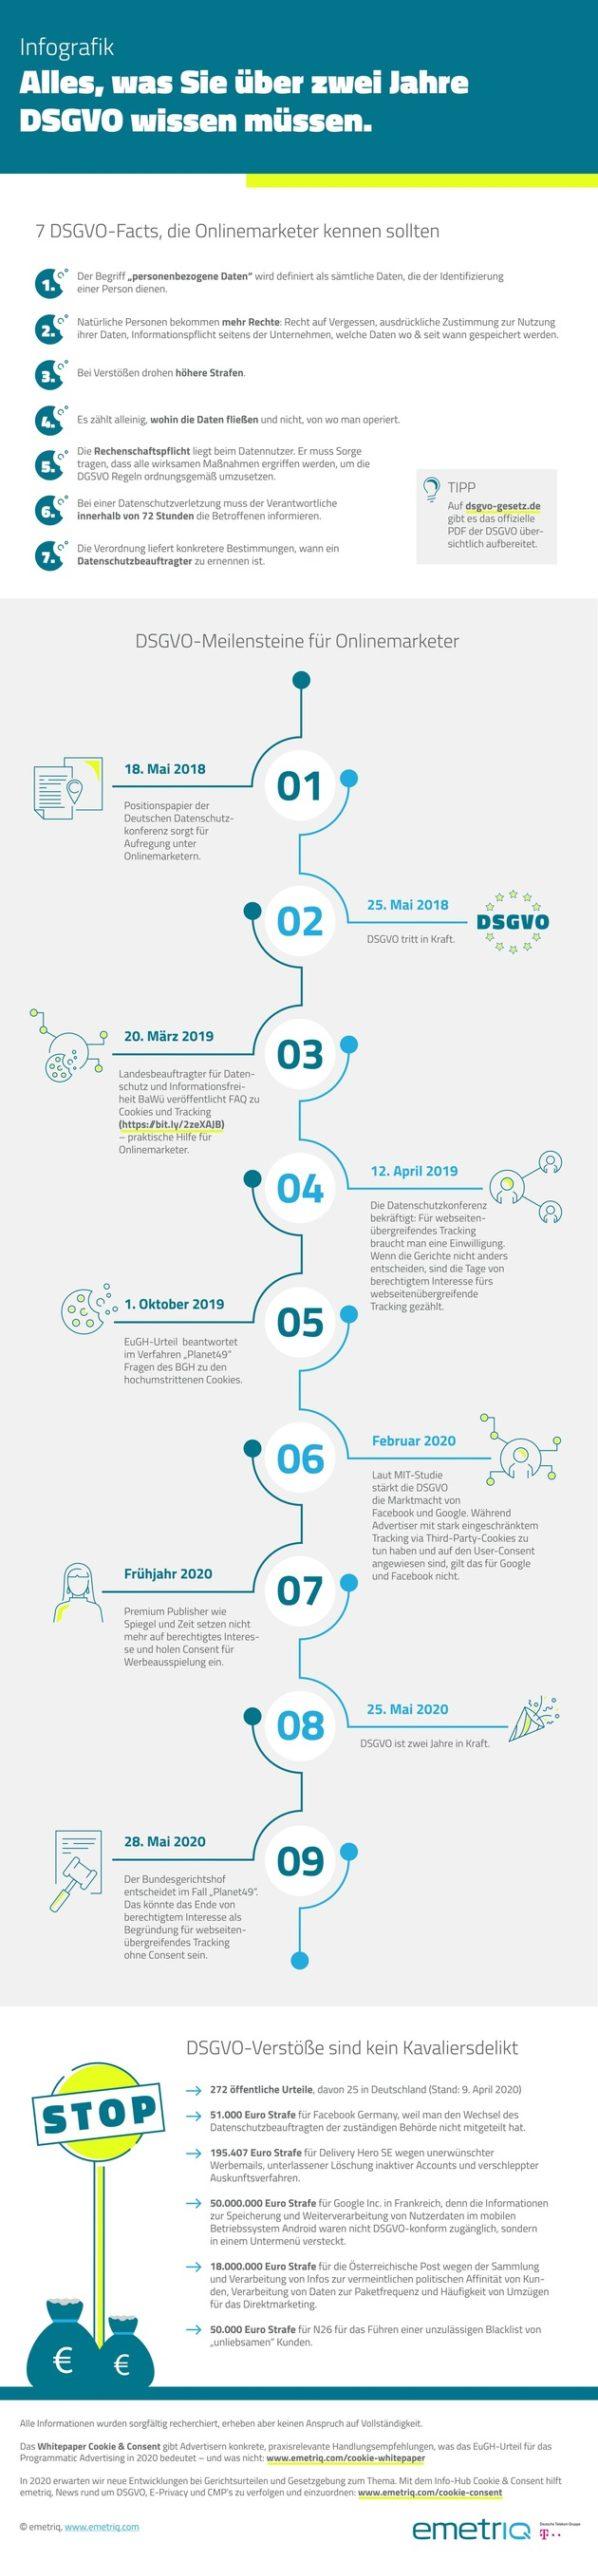 DSGVO Infografik